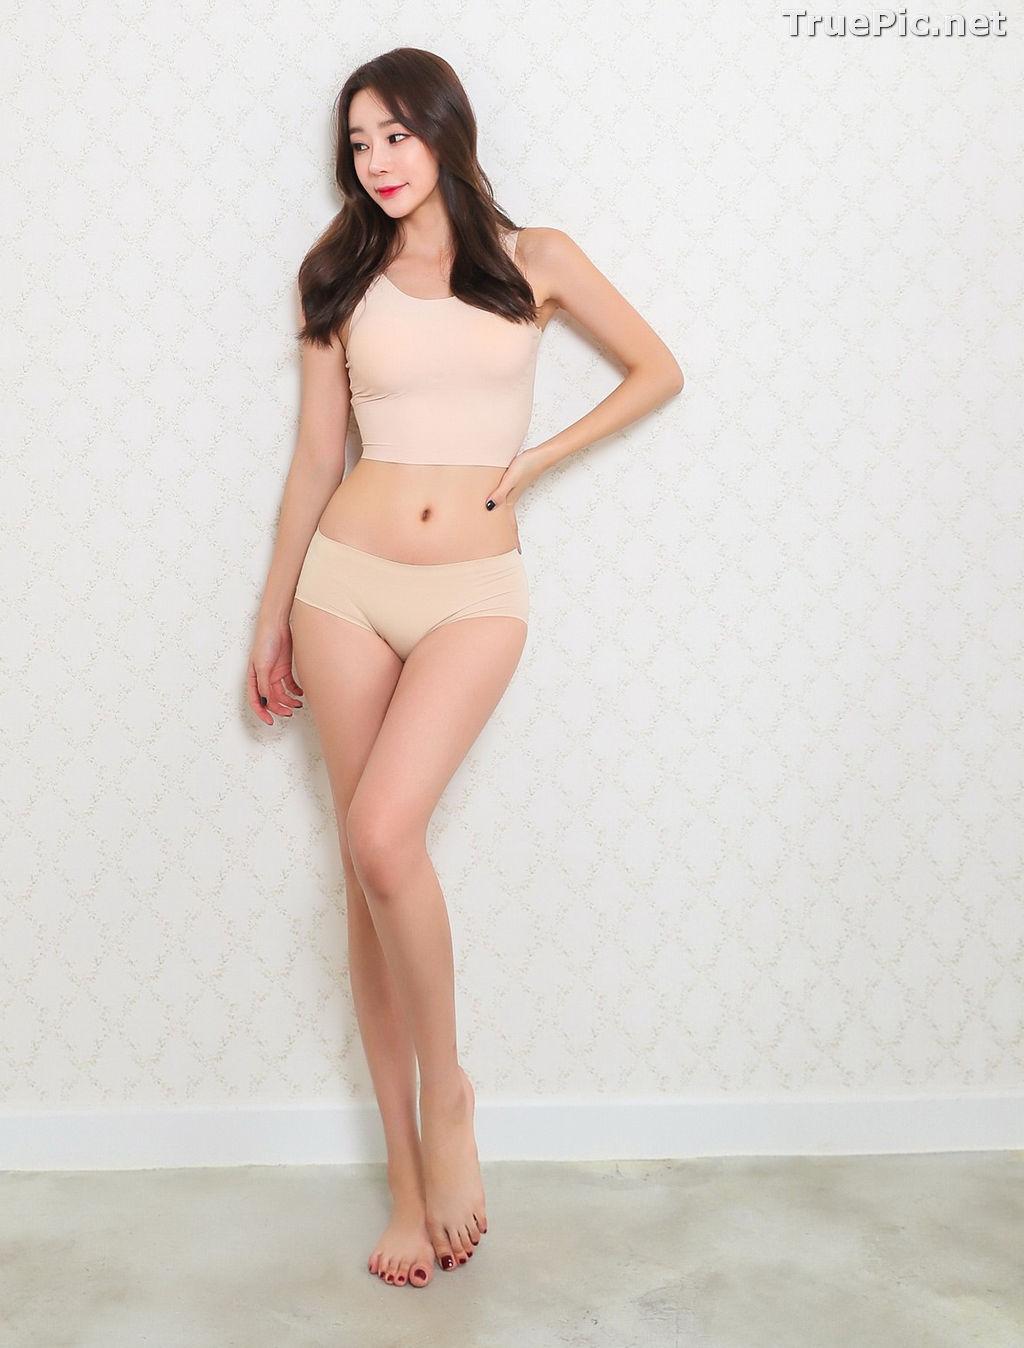 Image Hyun Kyung - Korean Fashion Model - Nude Color Undies - TruePic.net - Picture-4